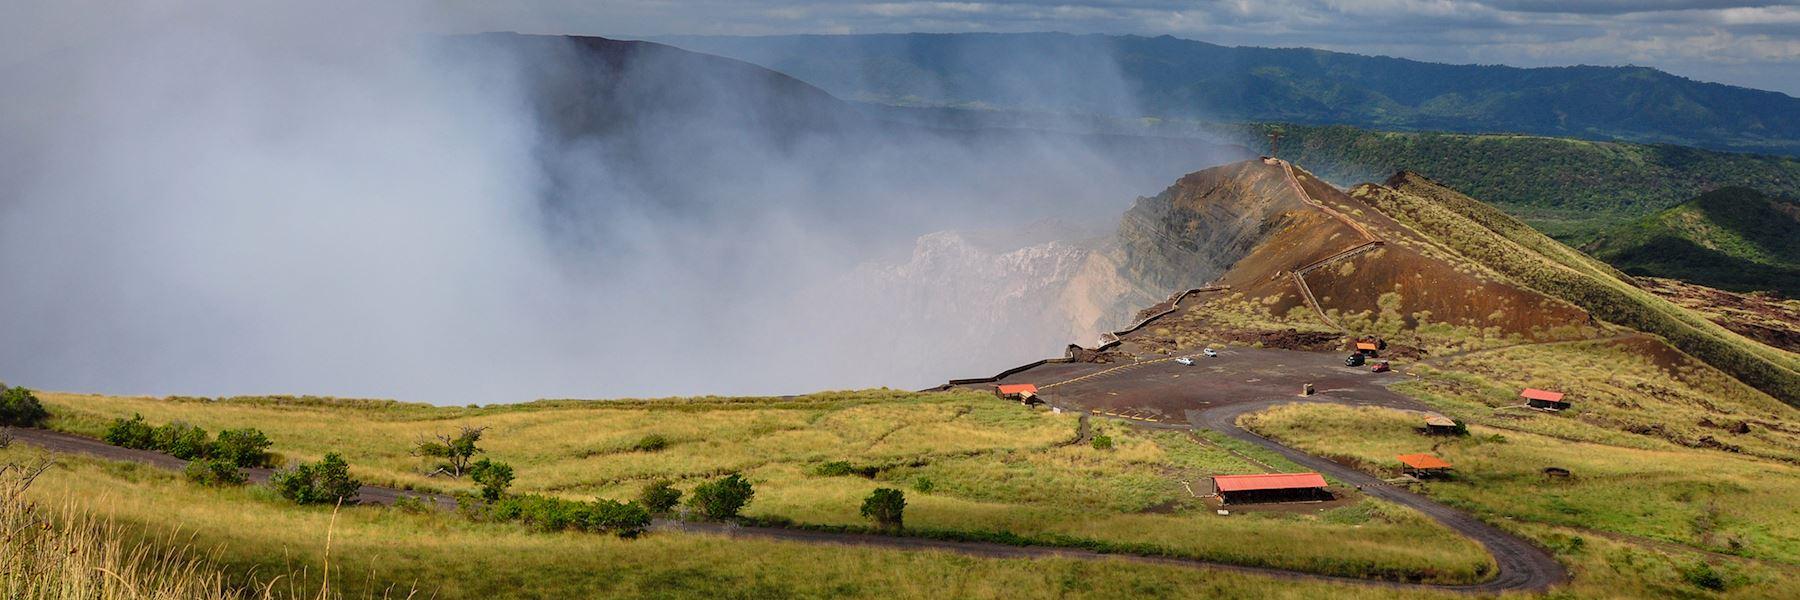 Visit Masaya Volcano National Park, Nicaragua